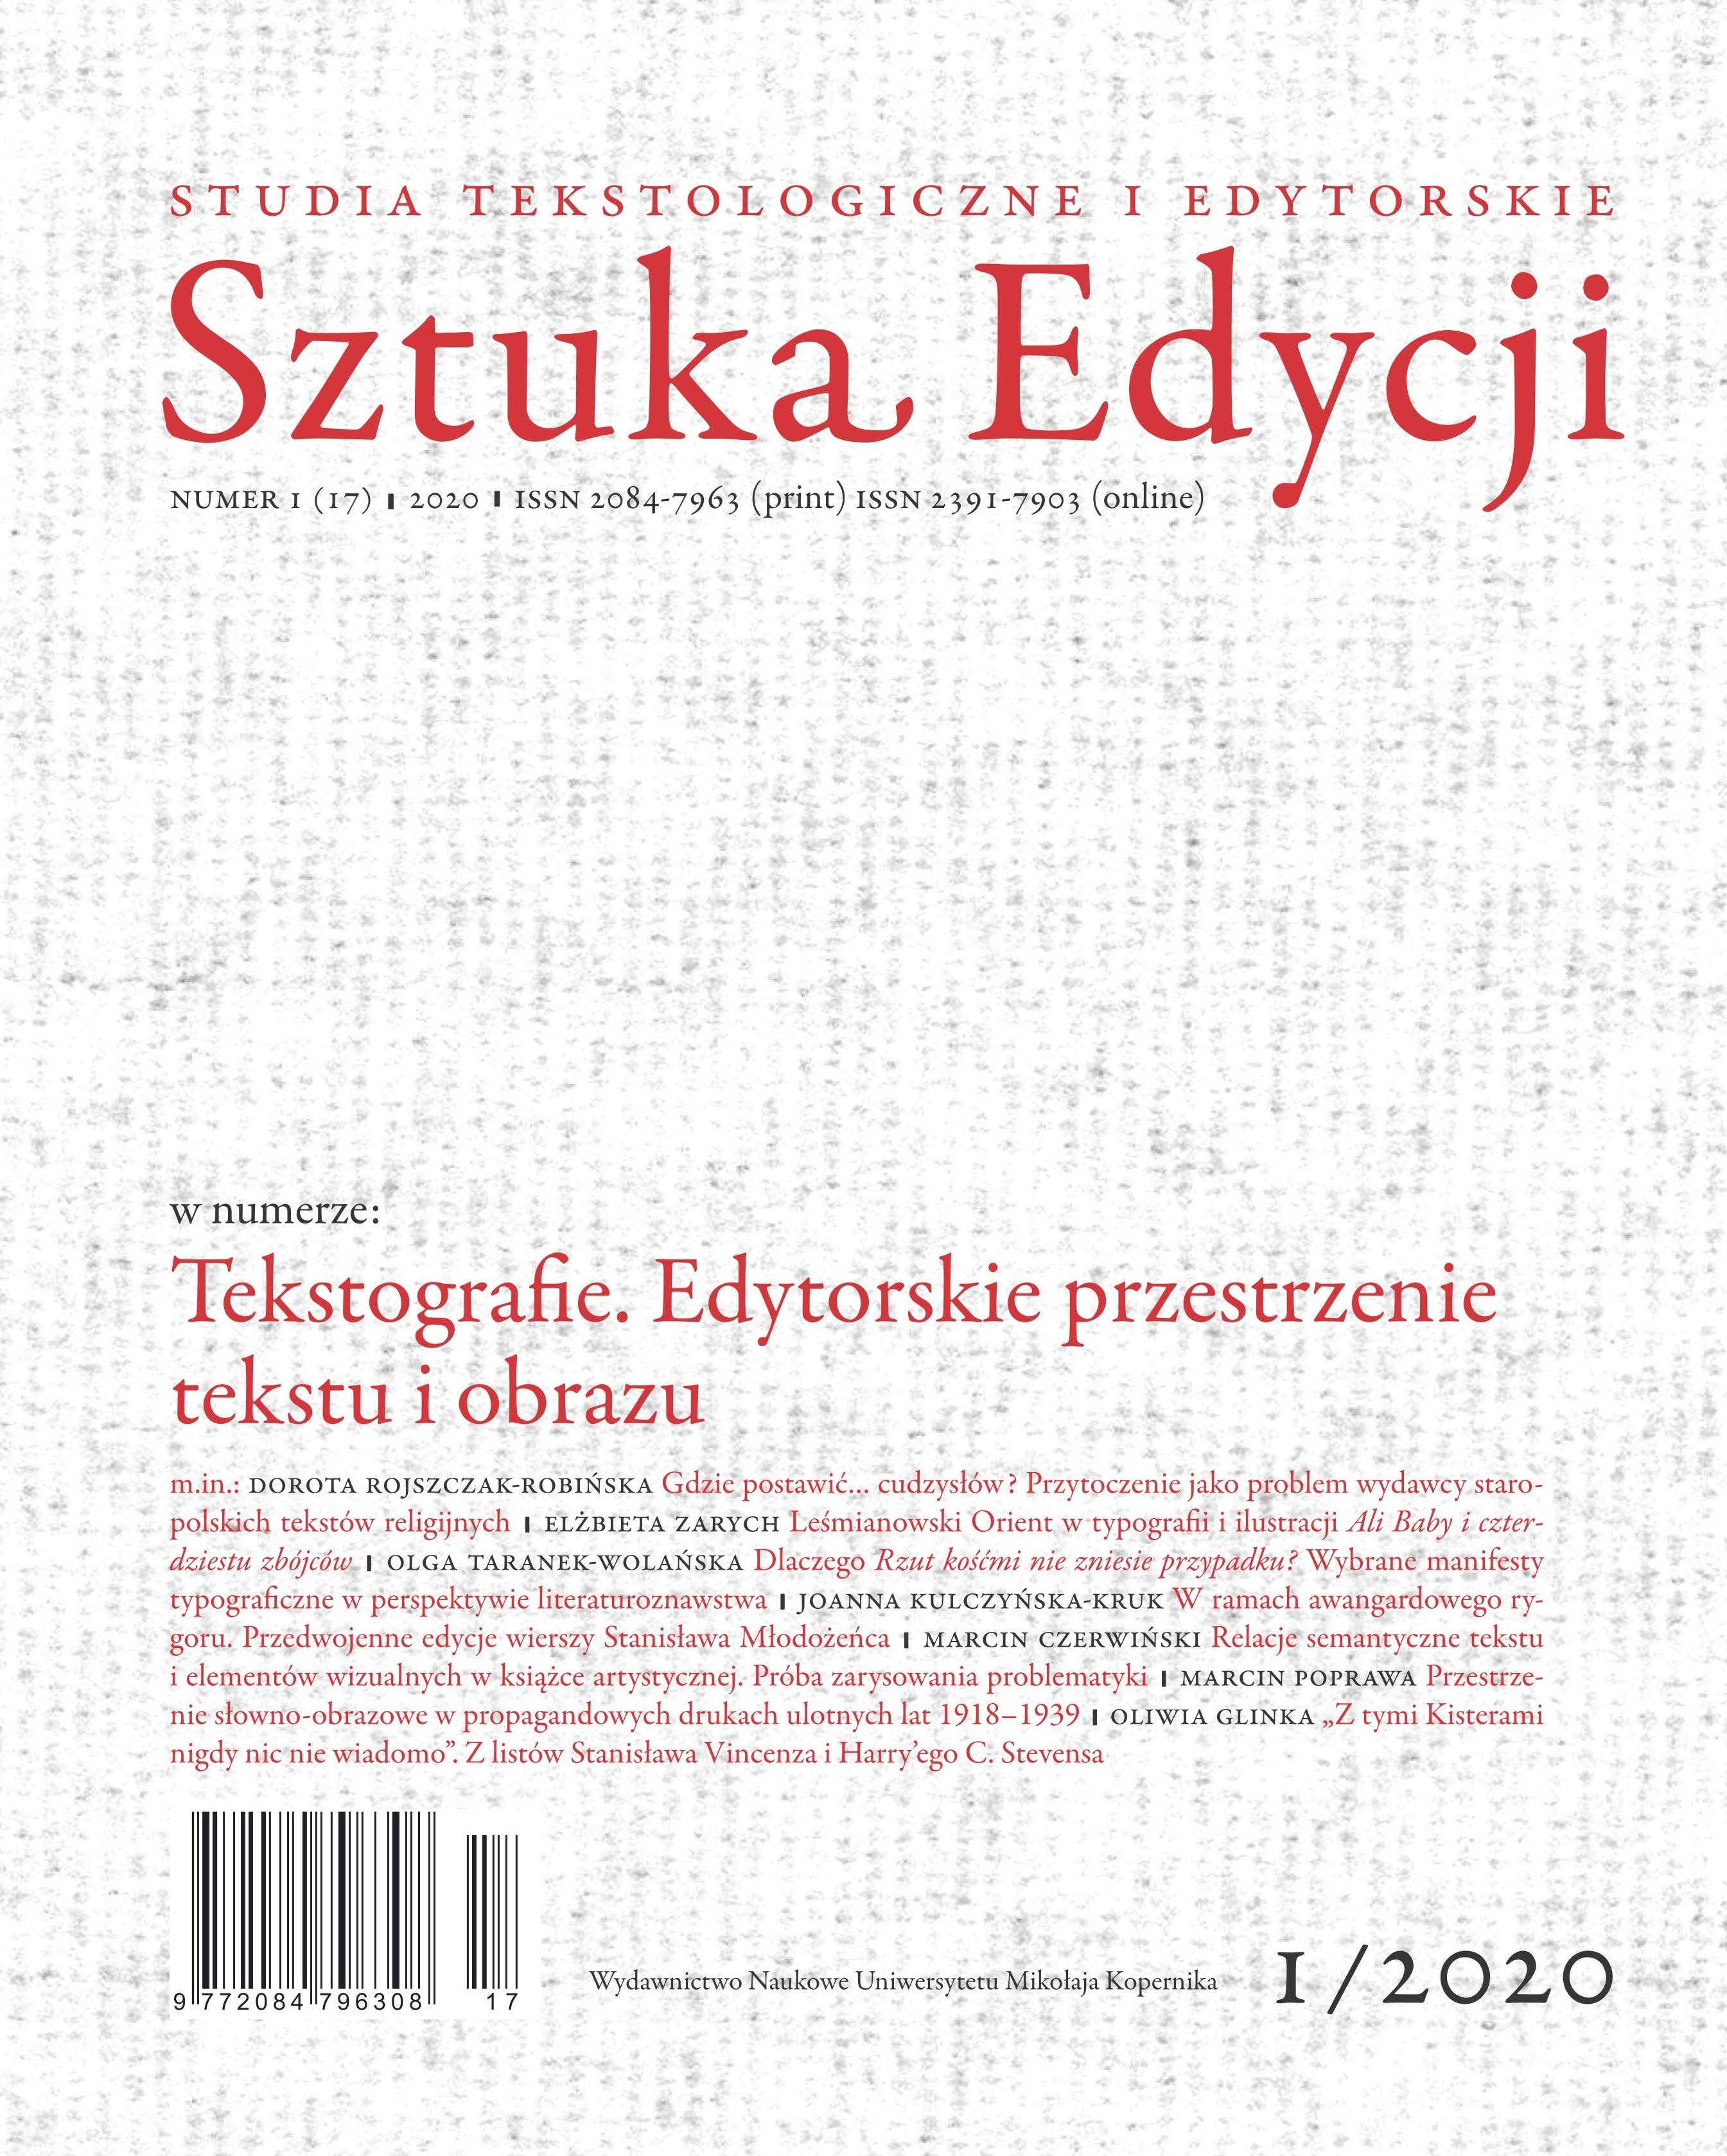 Sztuka Edycji vol. 1/2020